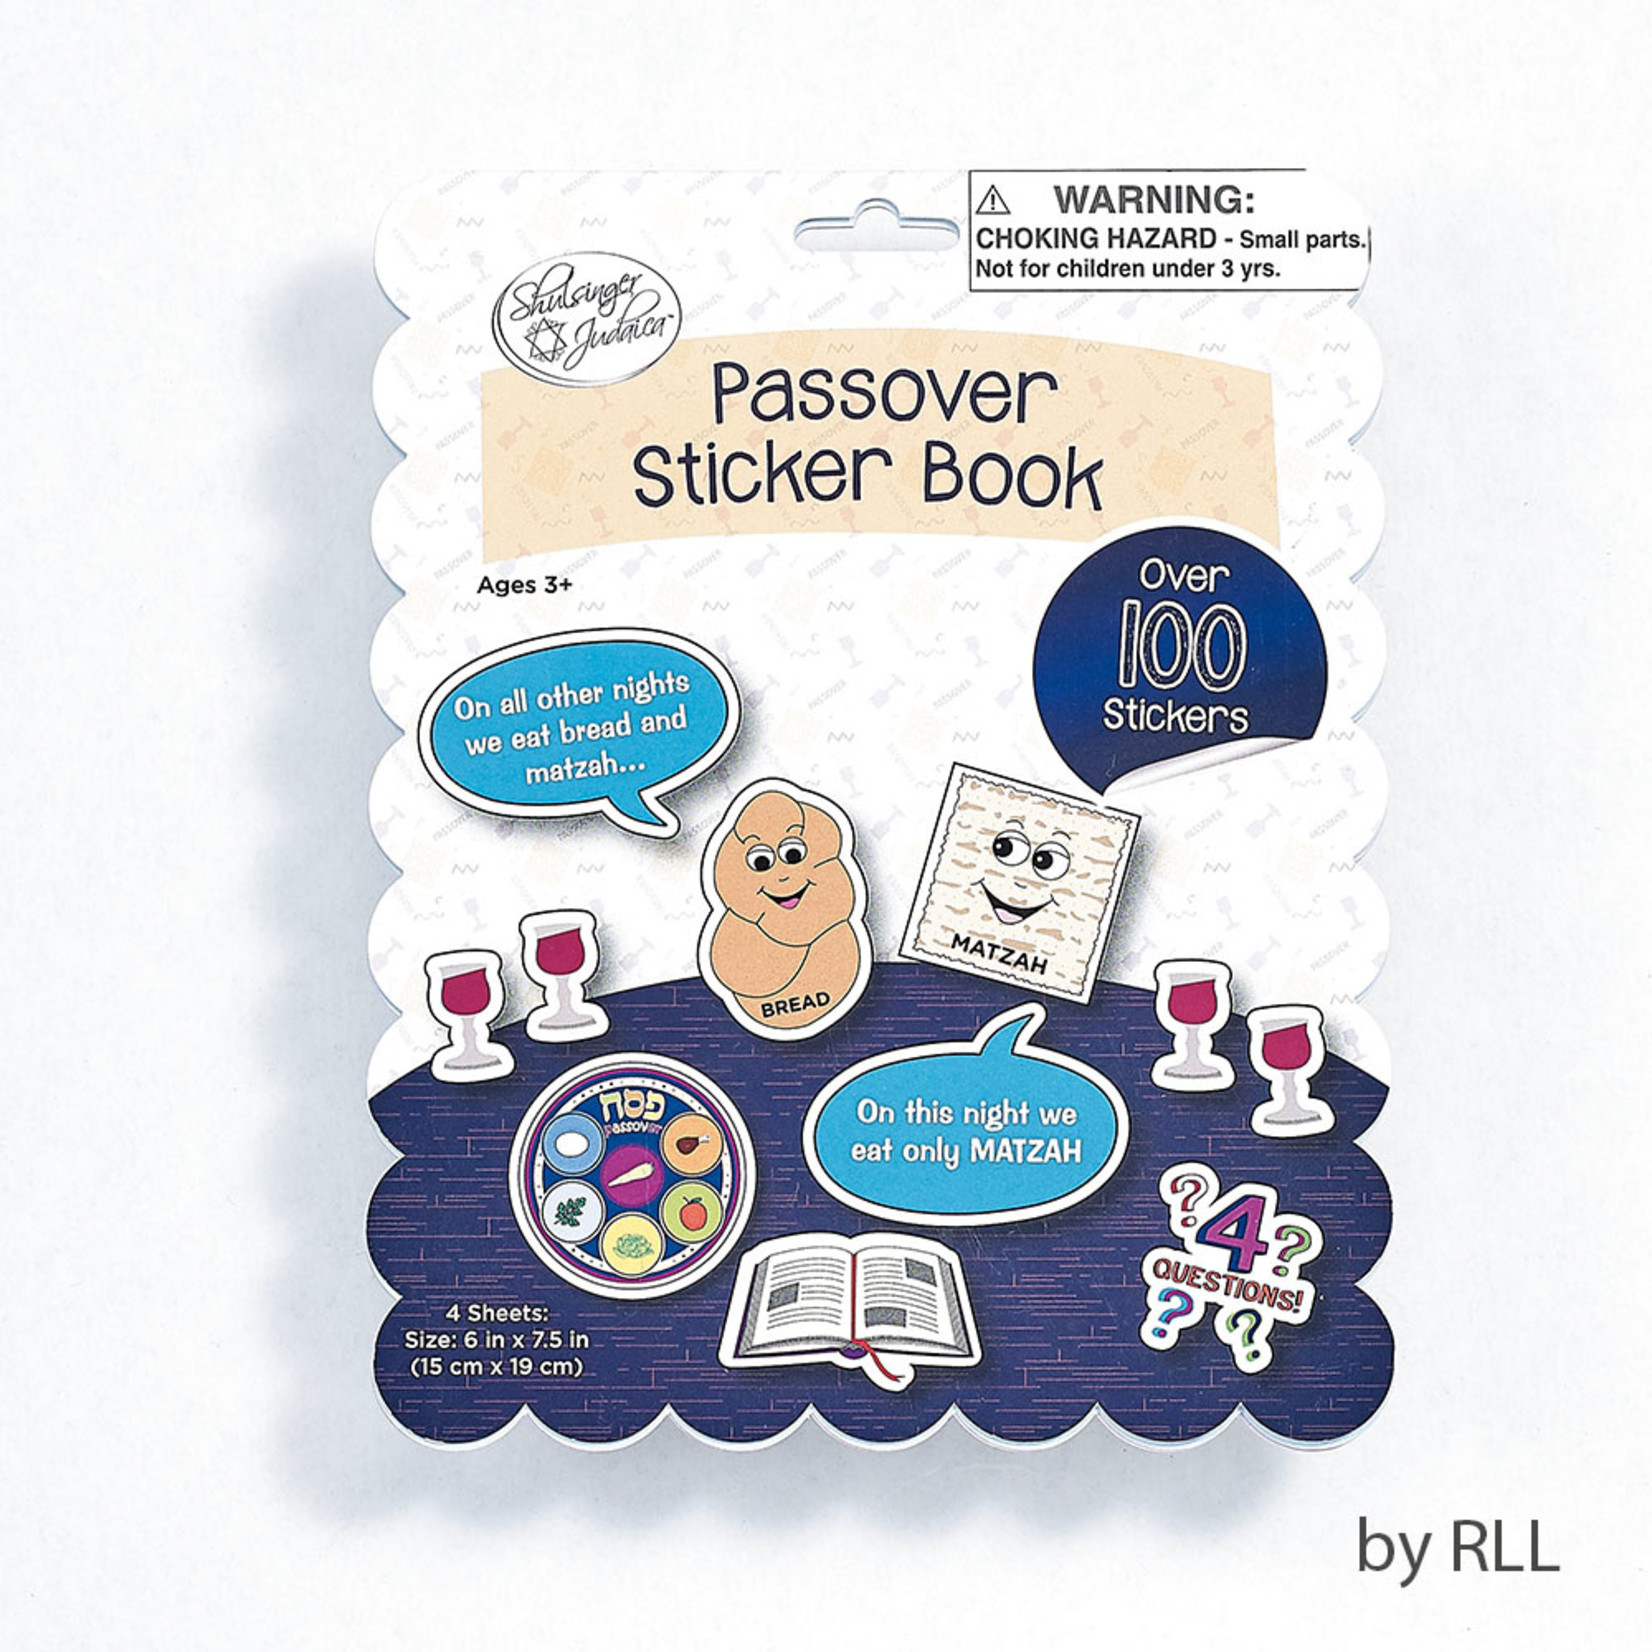 Passover Sticker Book, 100 Stickers